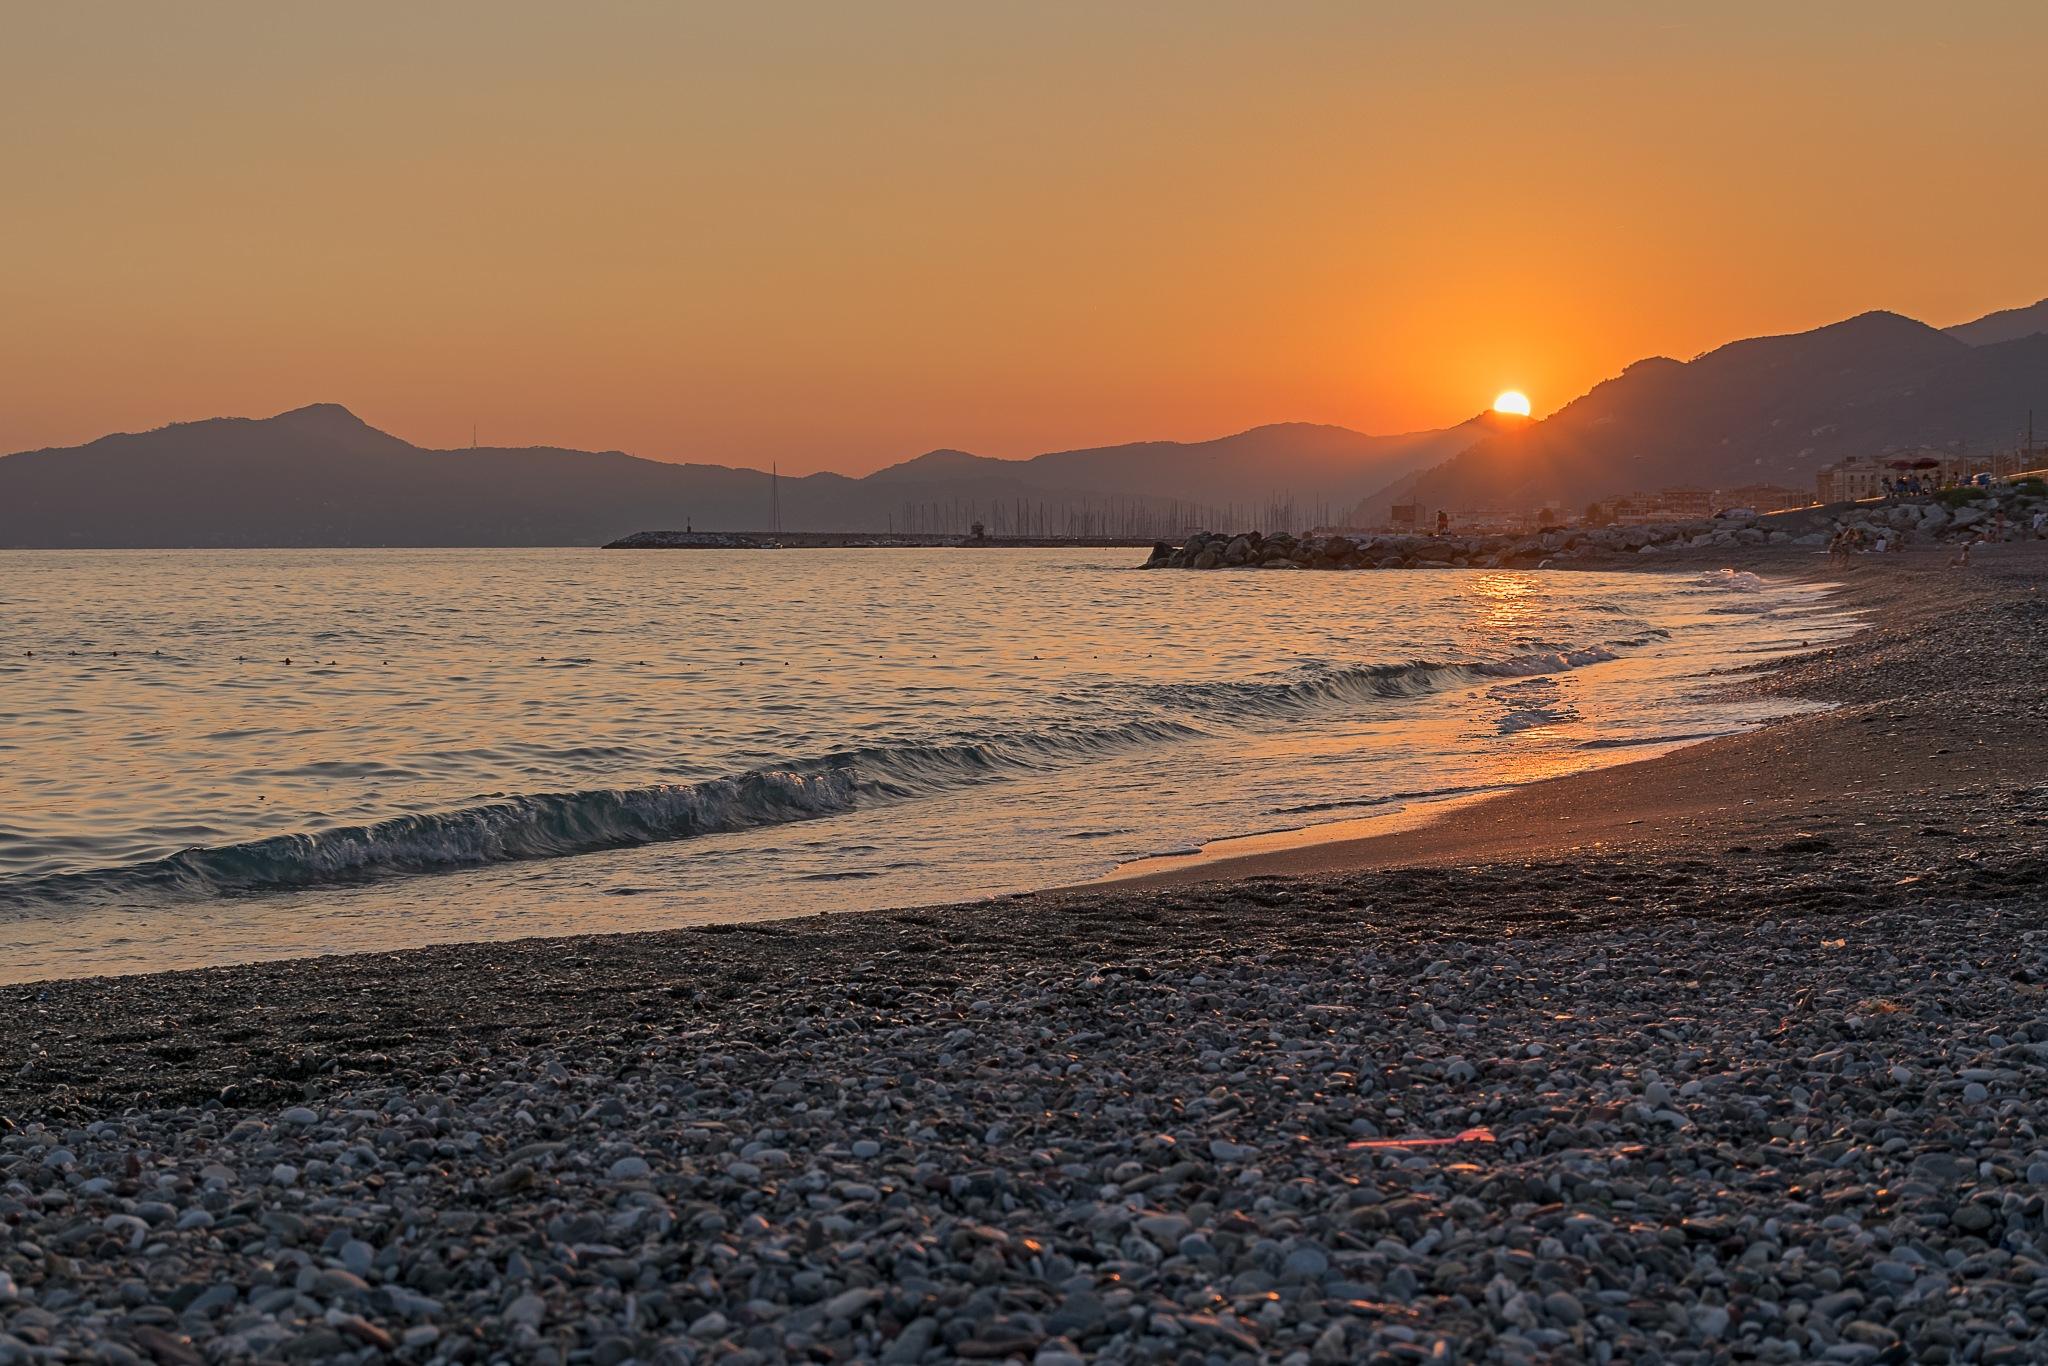 Sunset at the sea by Mauro De Vita